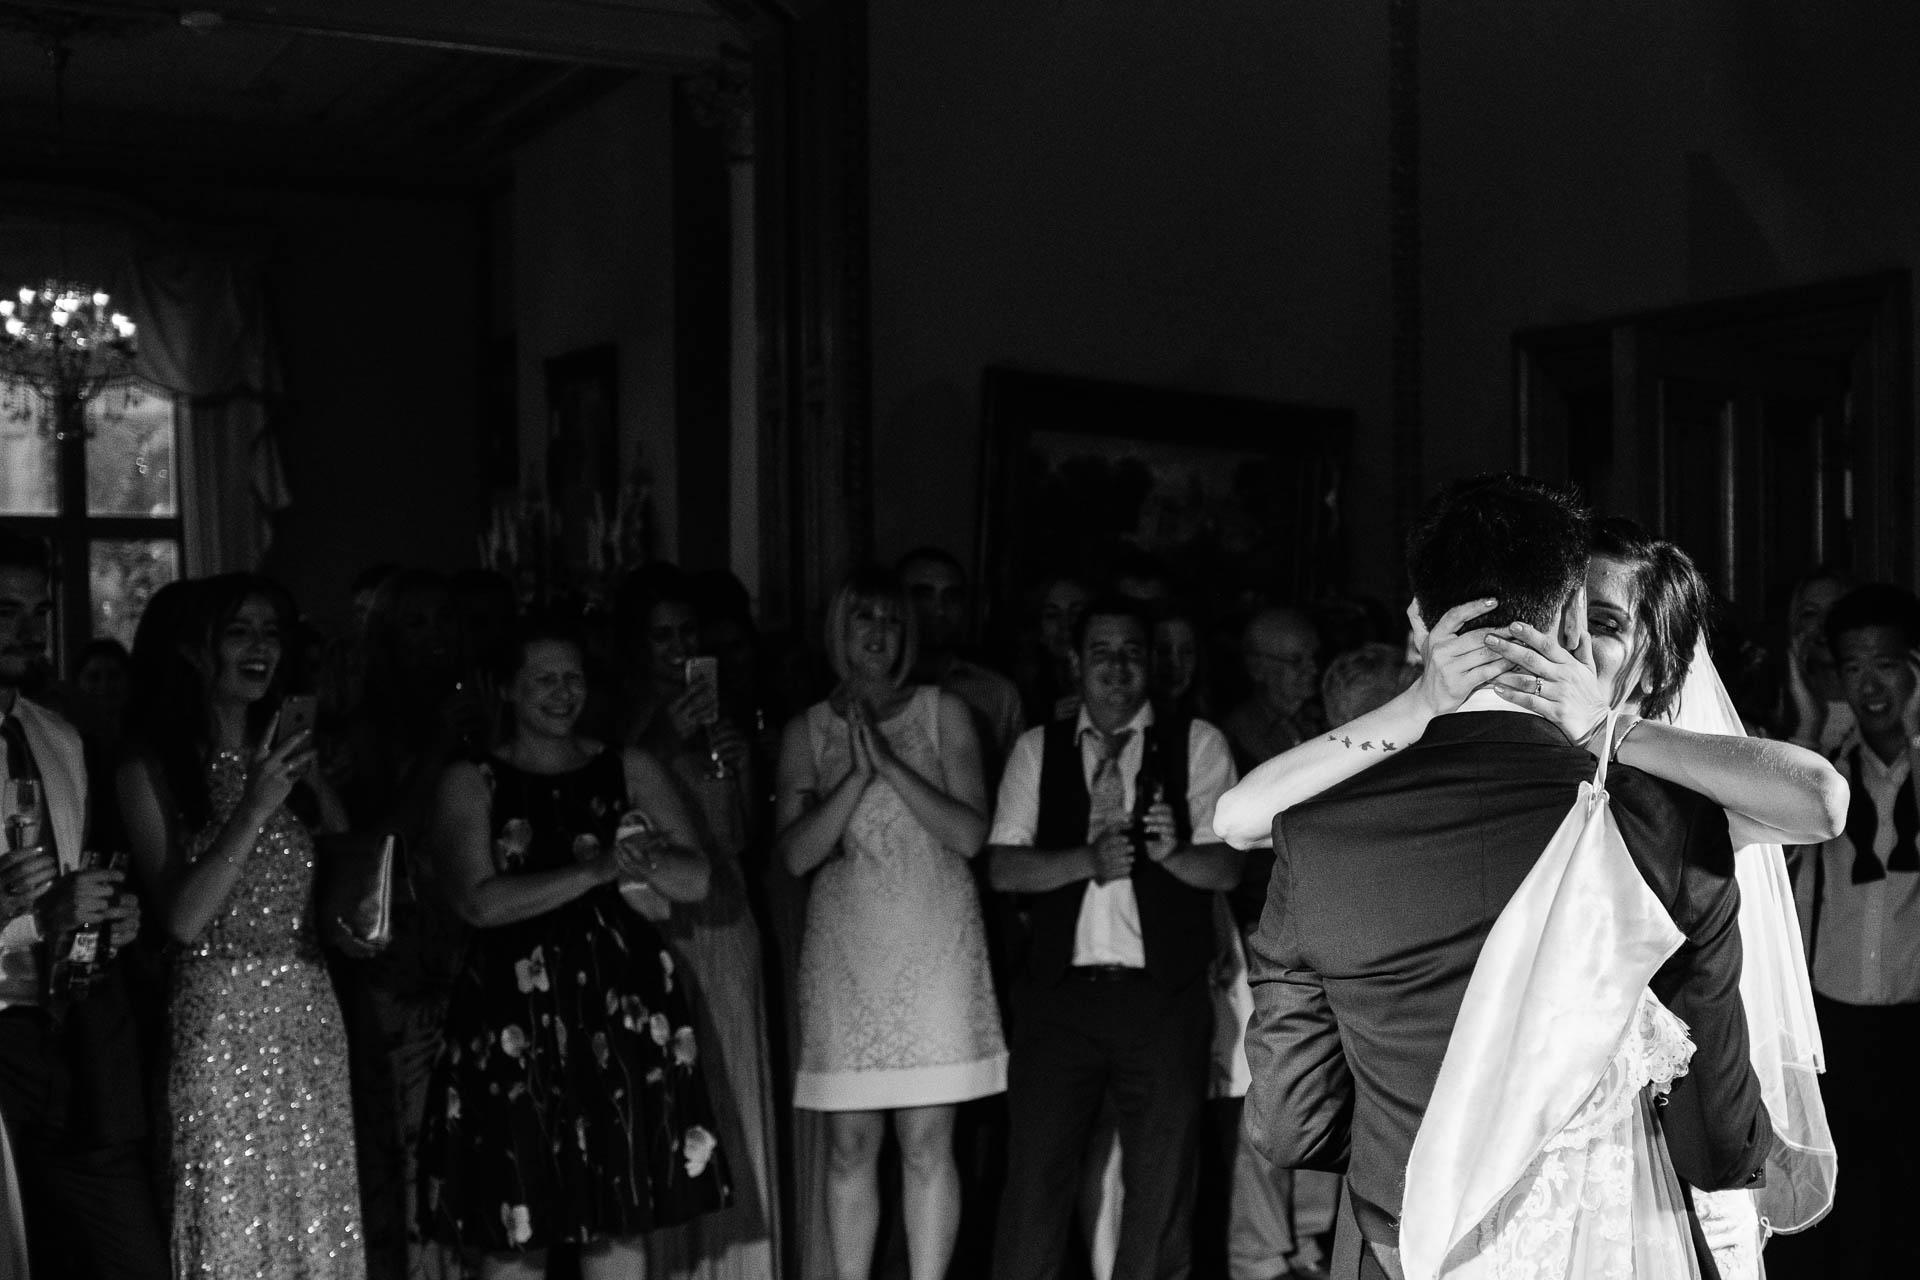 orchardleigh house wedding - Danni & Barney (496).jpg